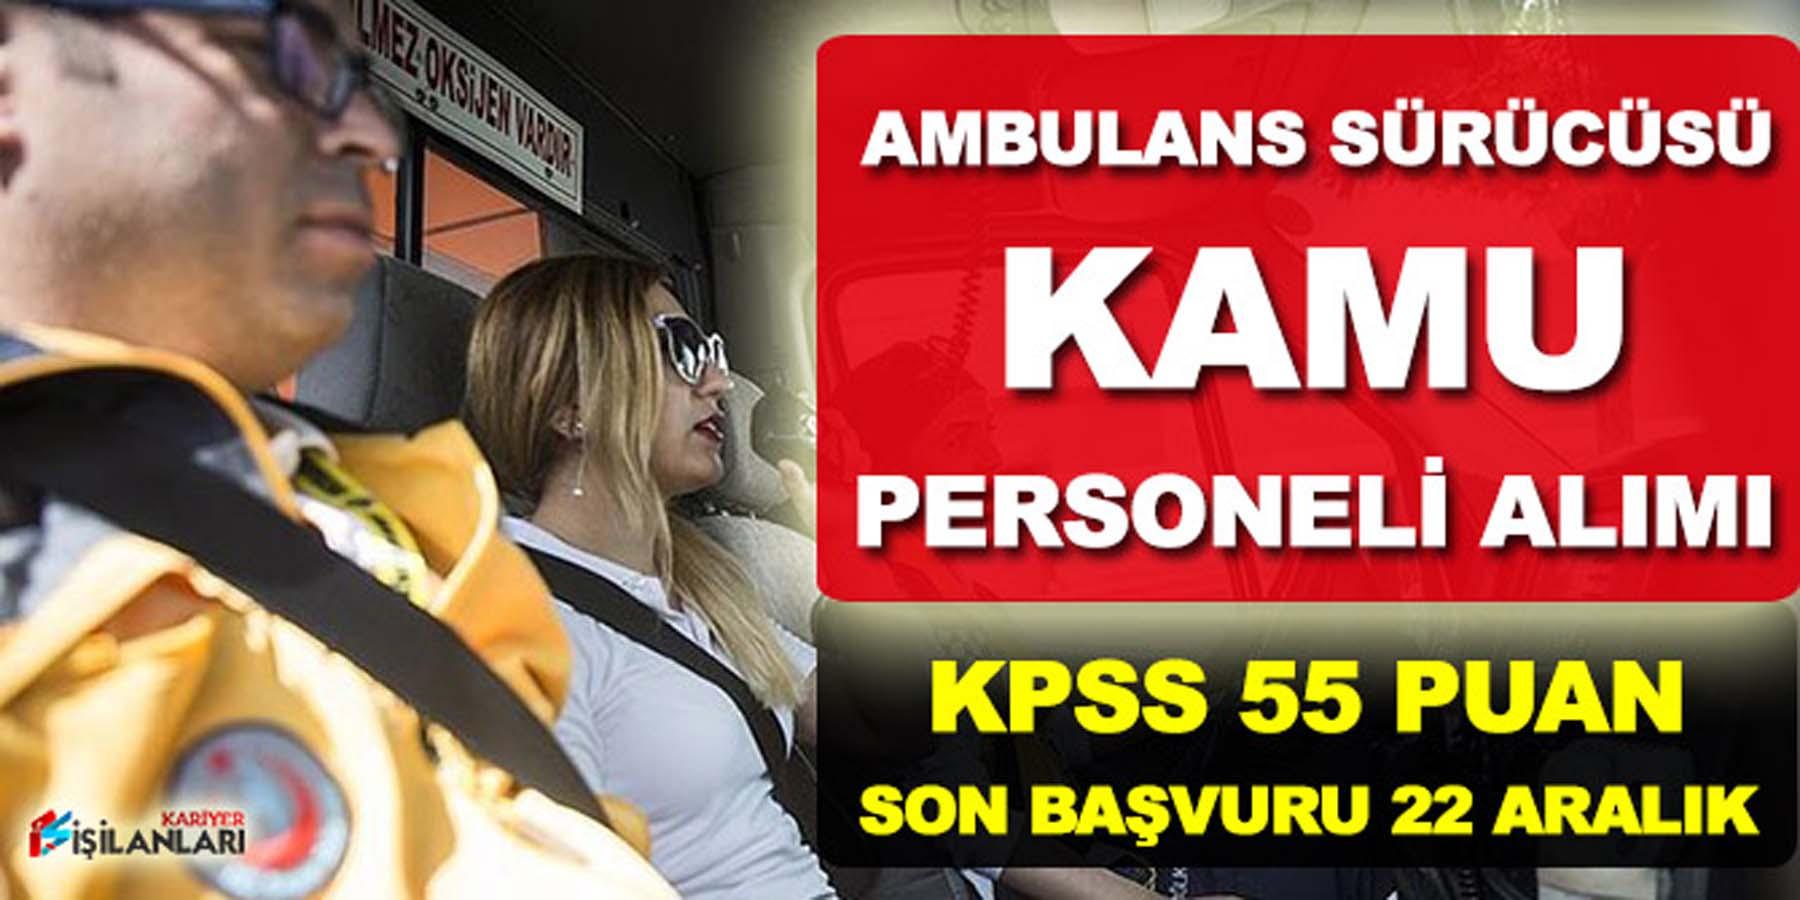 KPSS 55 Puanla Kamu Personel Alımı (Ambulans Sürücüsü Antrenör)